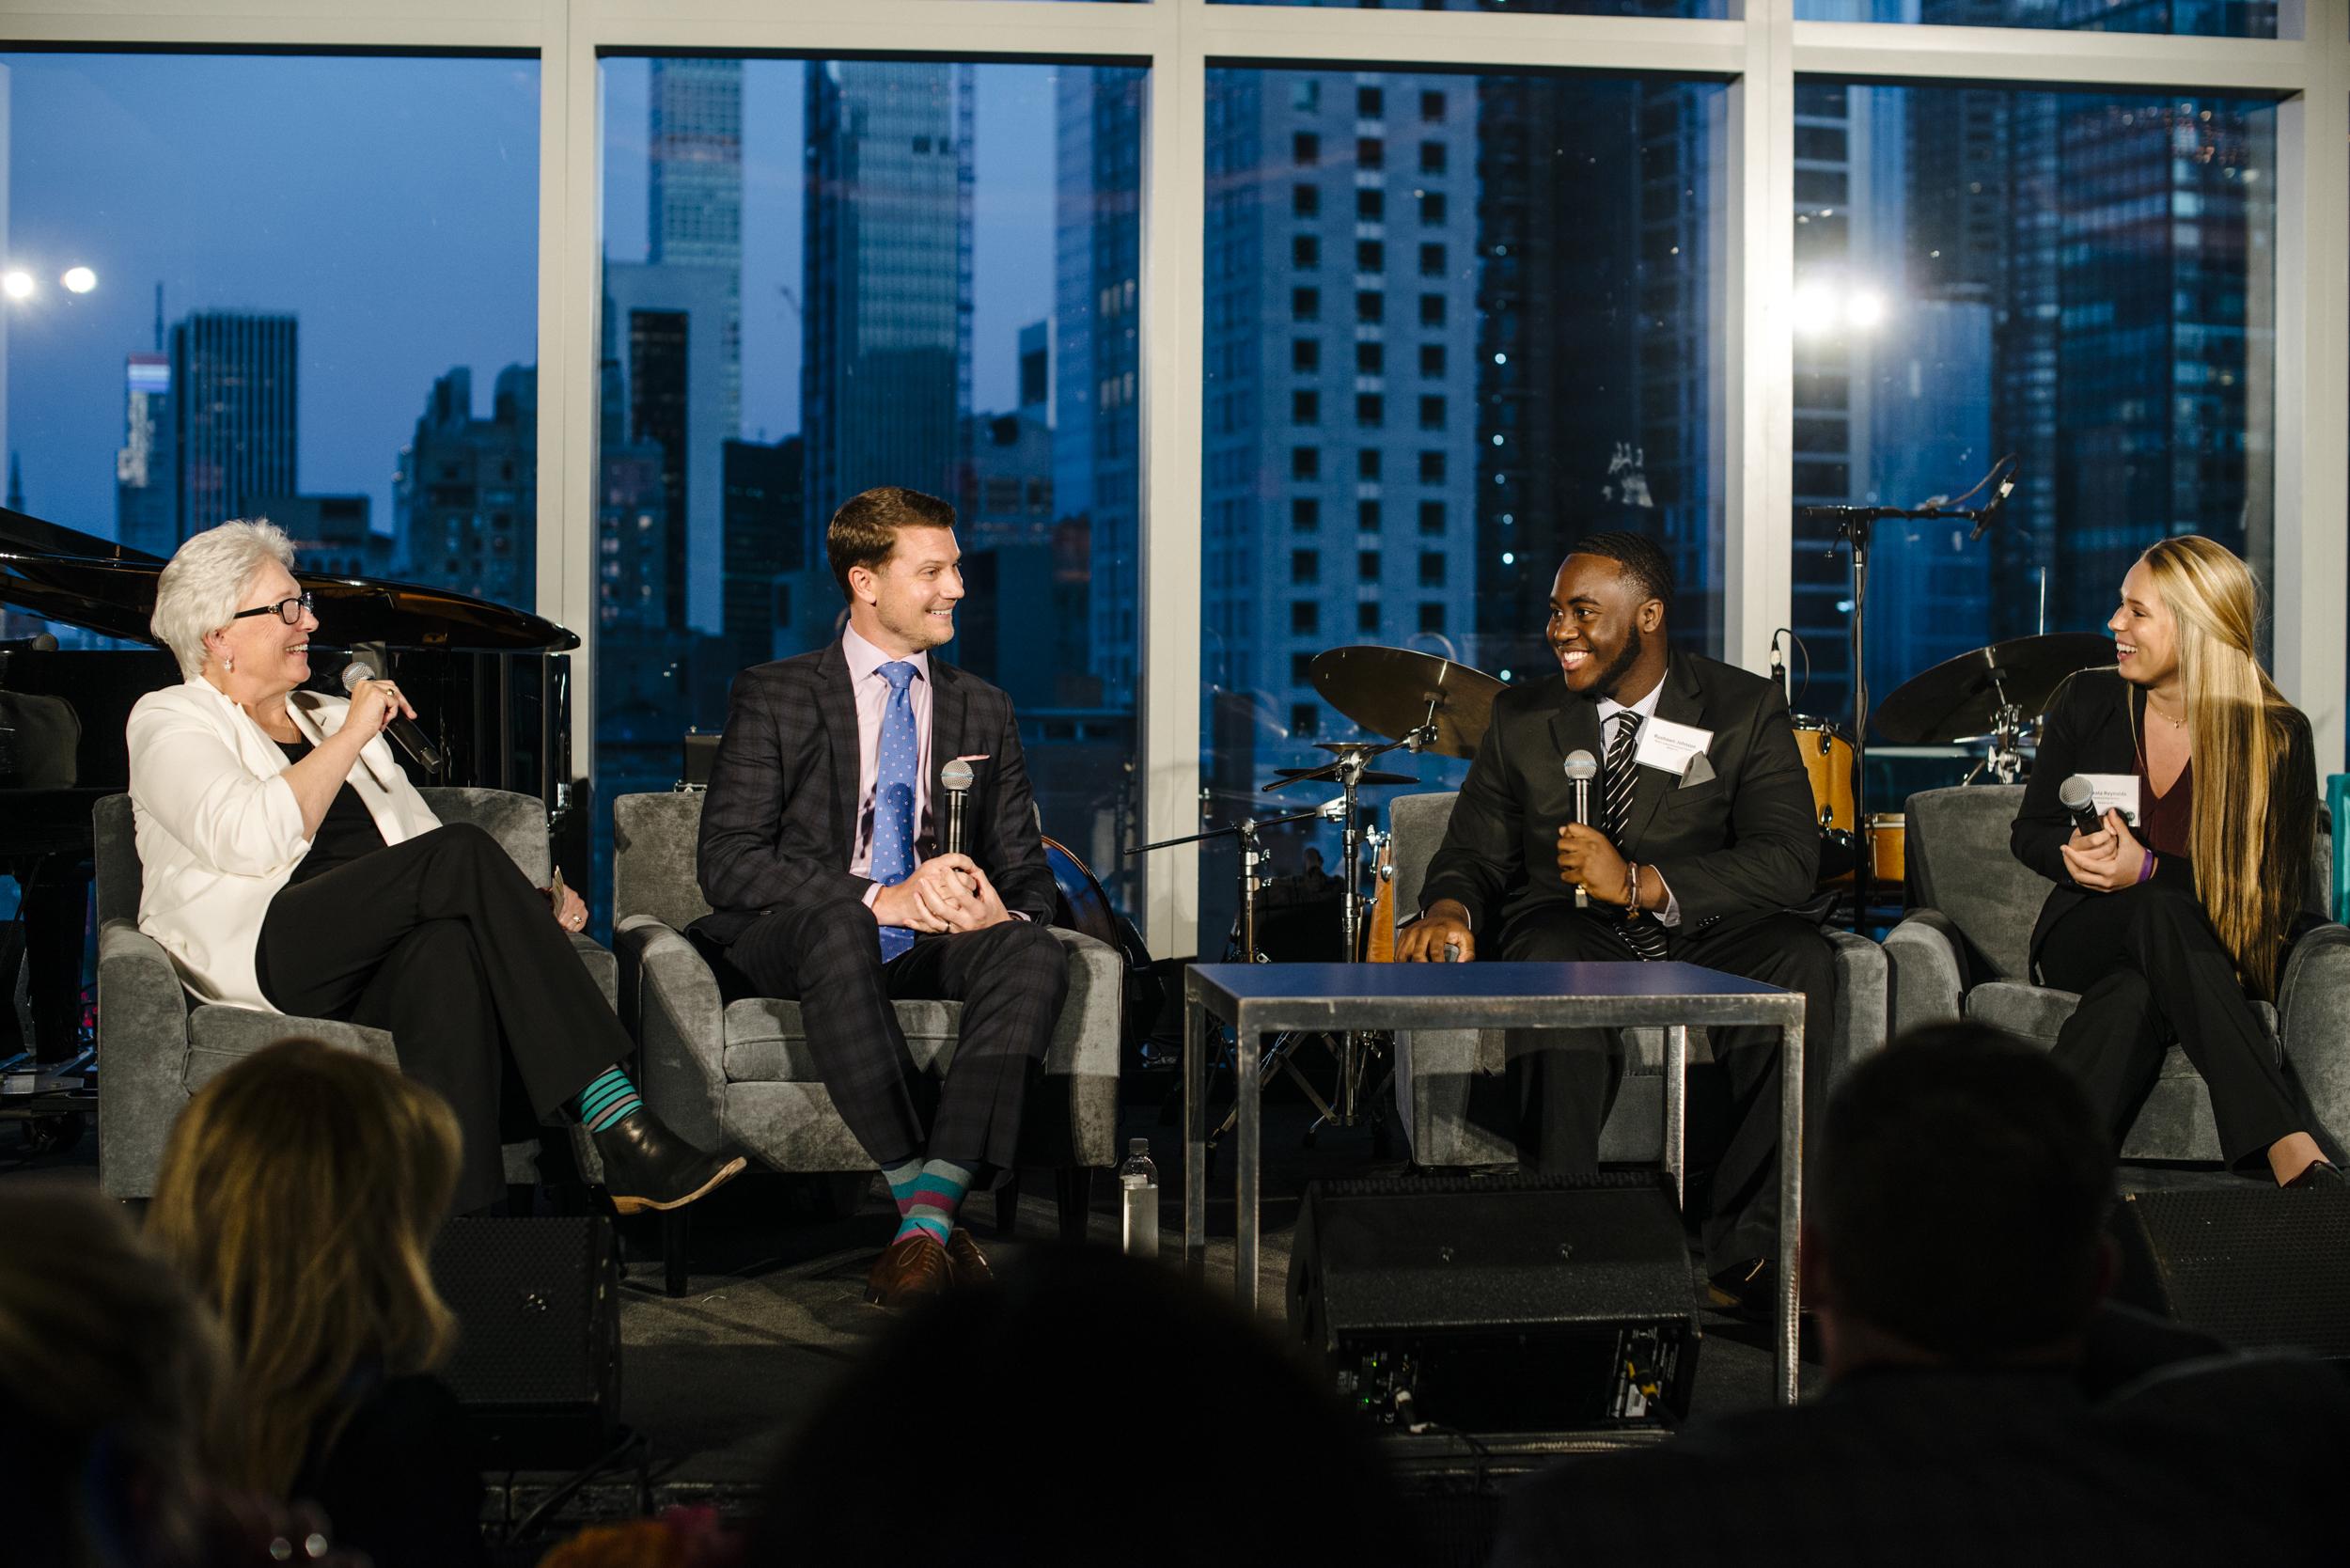 JD Hoye, Matt Zielinski, with student panelist: Rushawn Johnson, and Dakota Reynolds